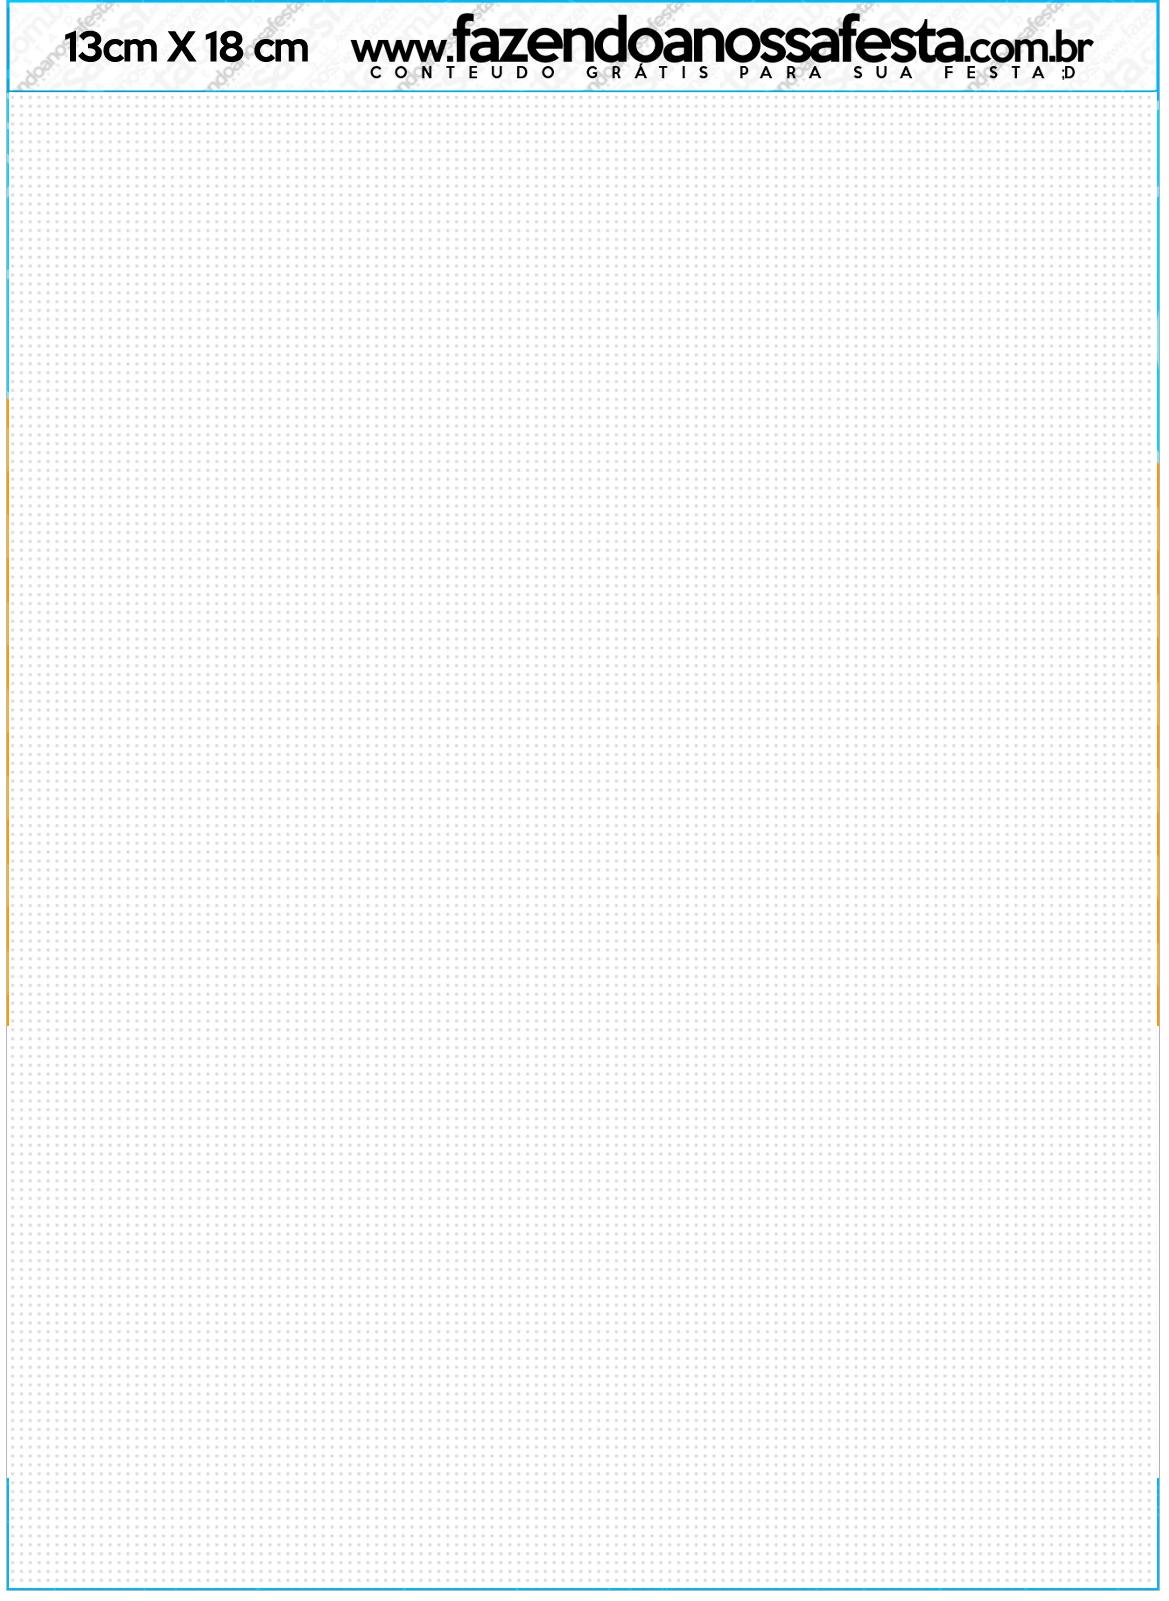 Convite com Envelope Pipa Laranja e Azul